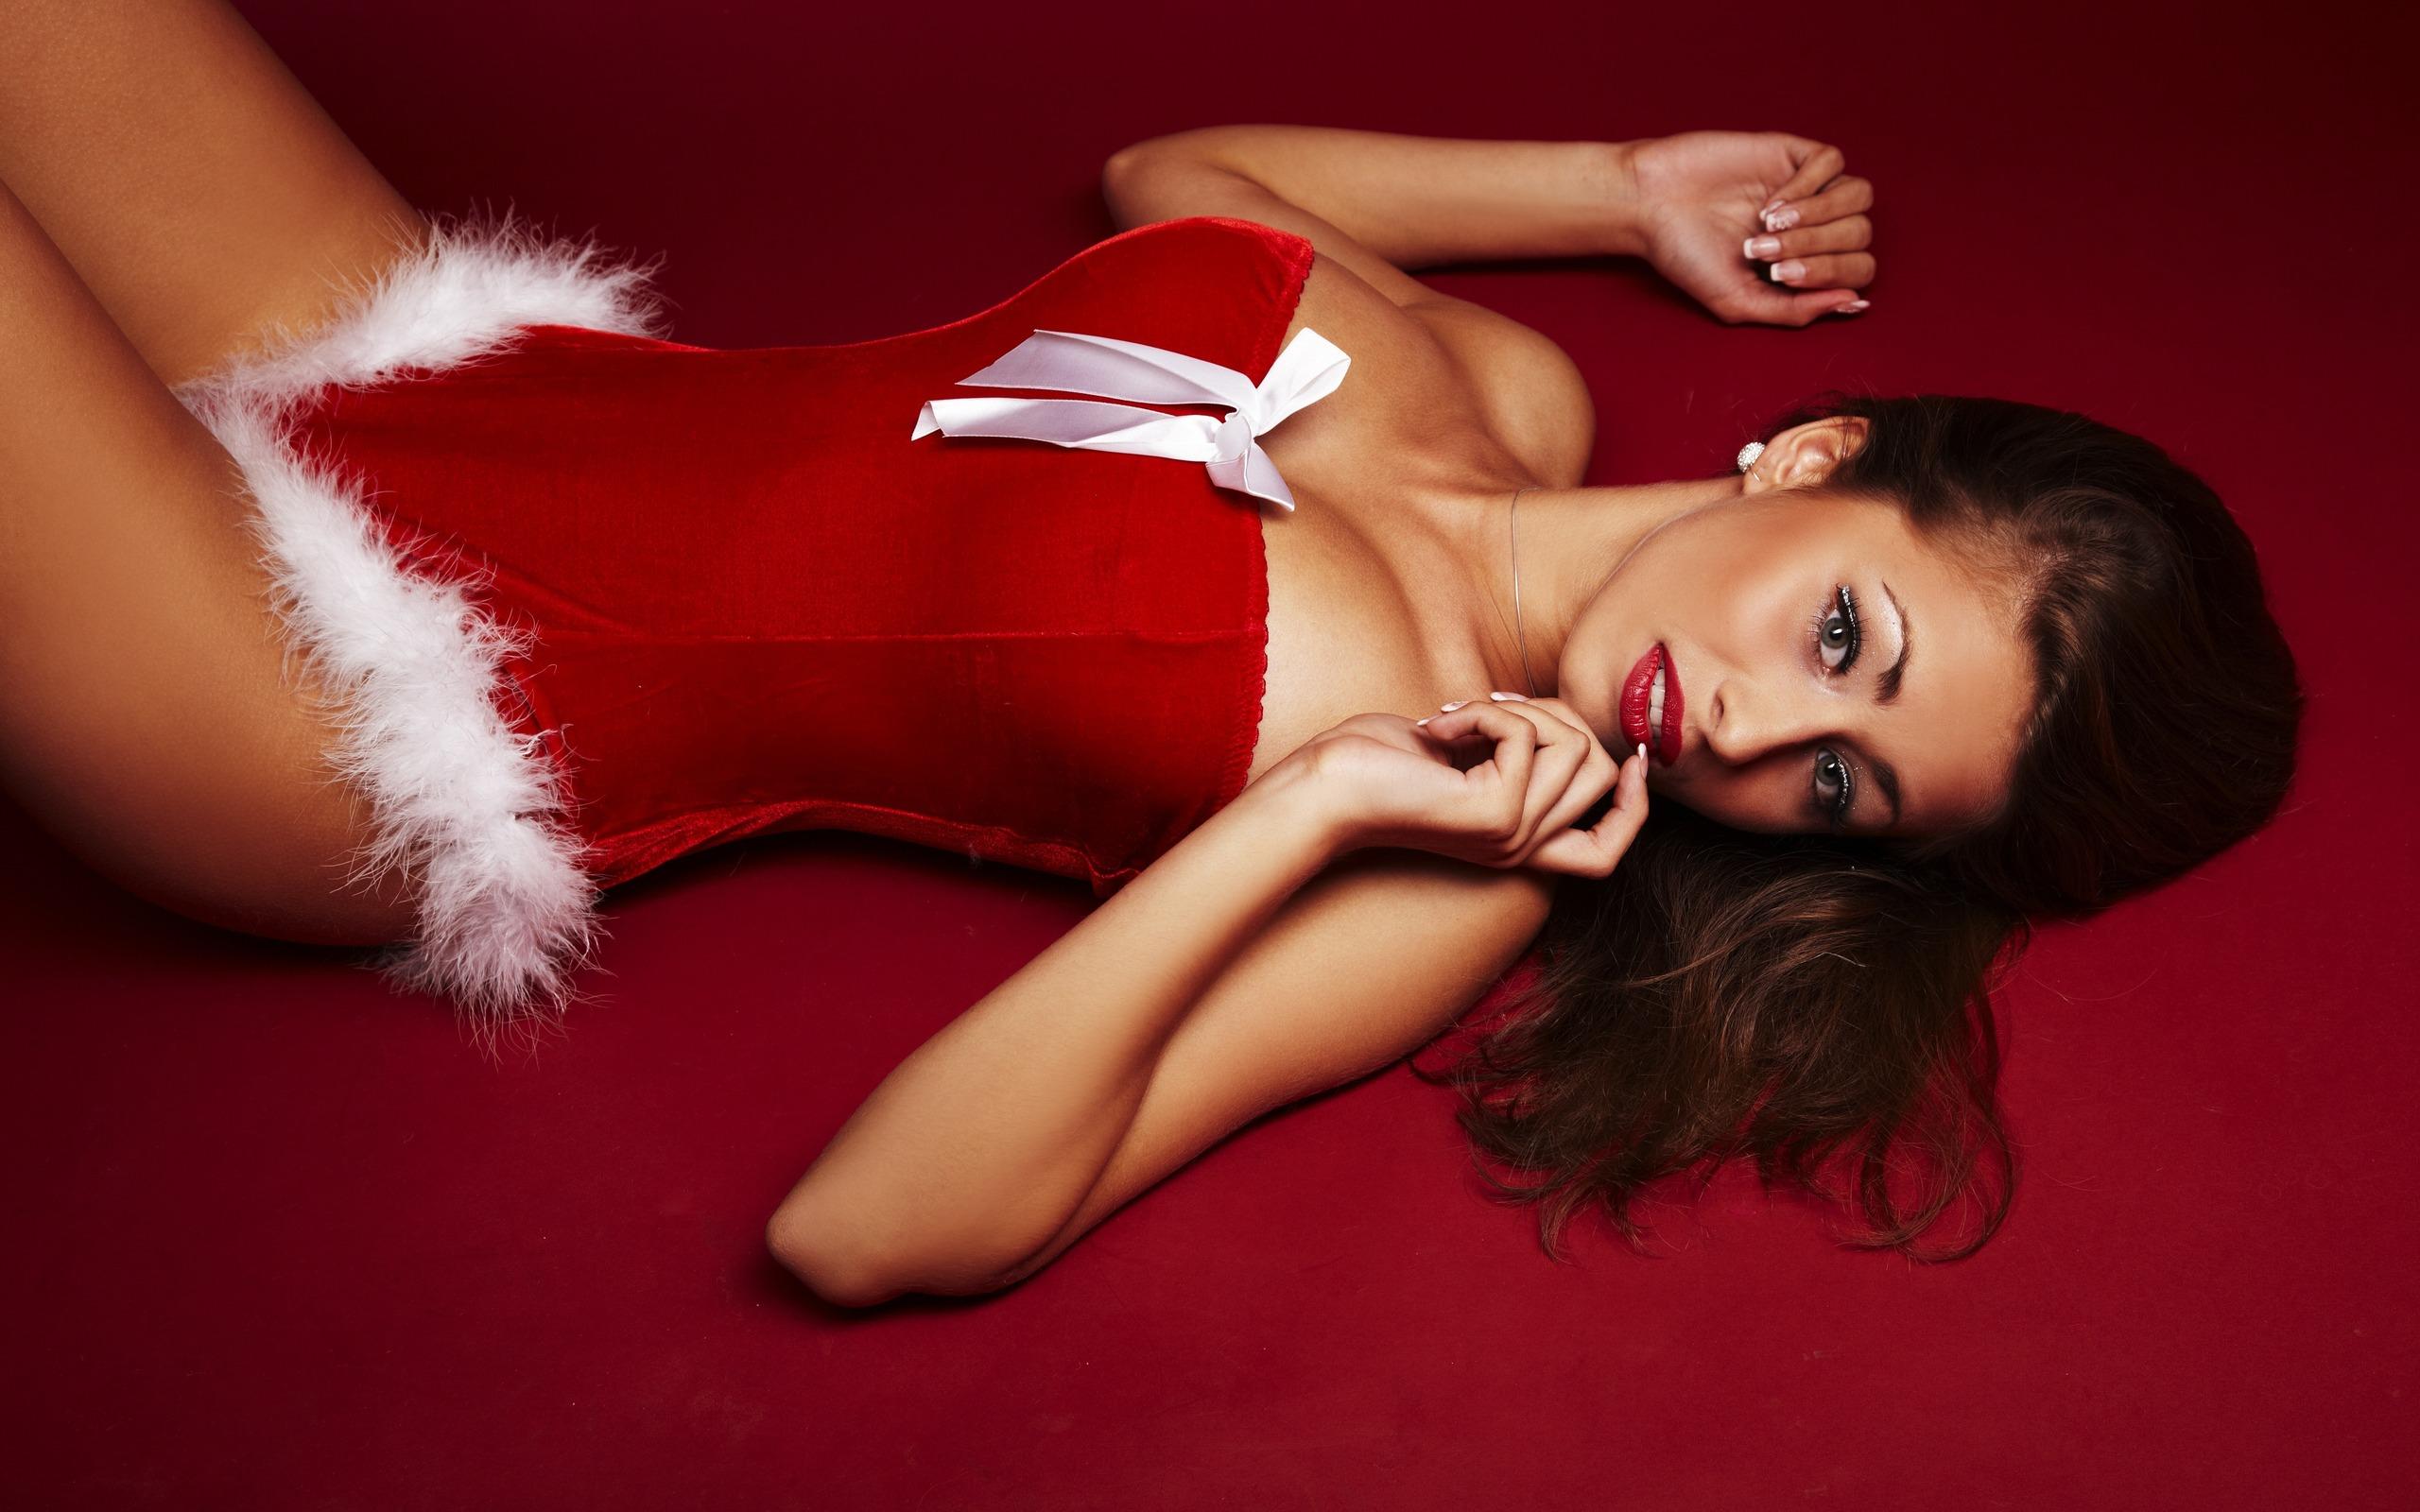 Girls_Christmas_Girls_The_girl_in_New_Year_s_body_028899_.jpg